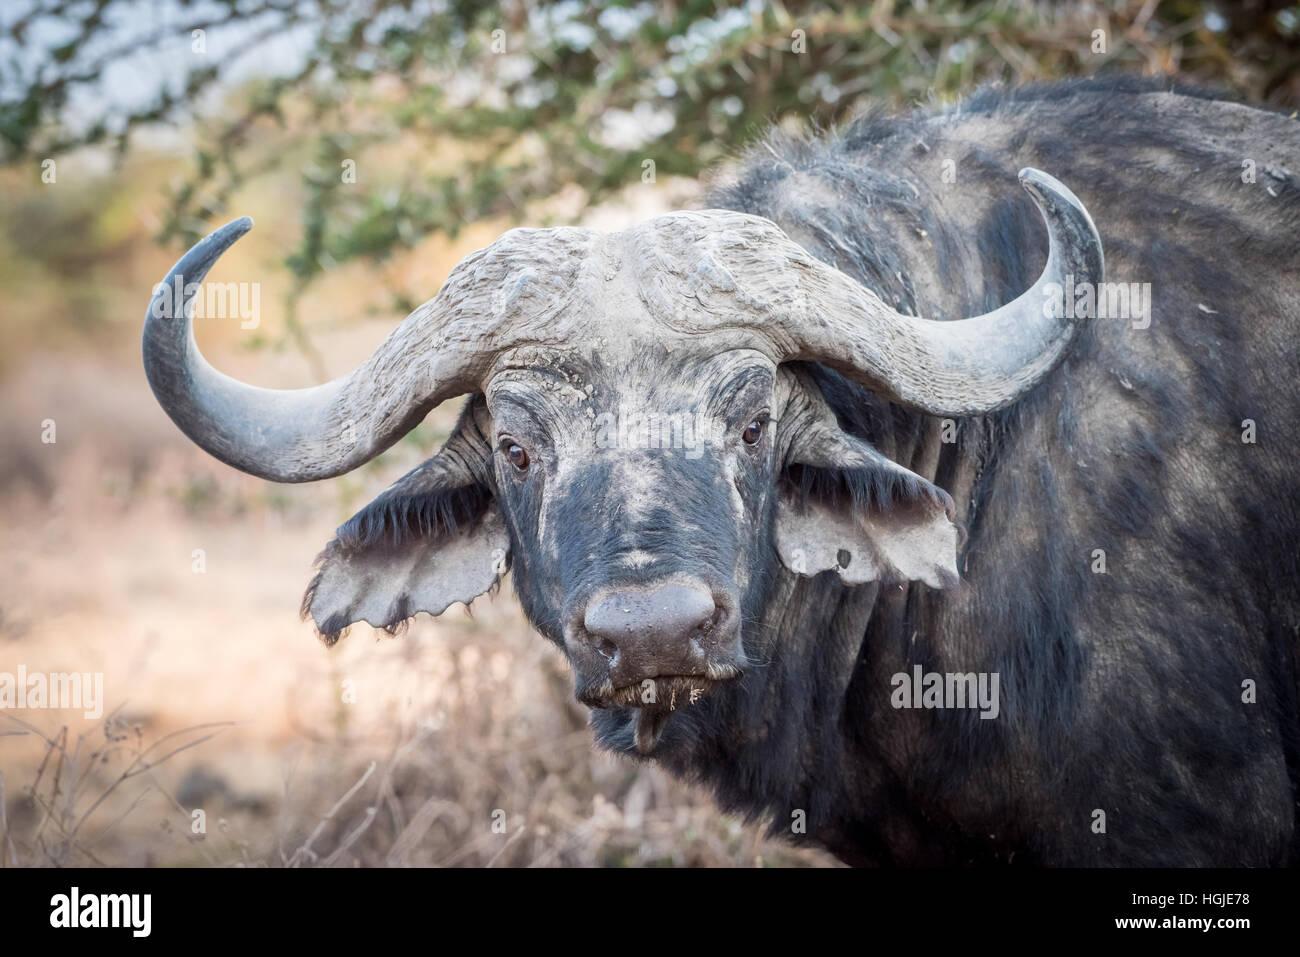 African Buffalo (Syncerus caffer) Portrait - Stock Image